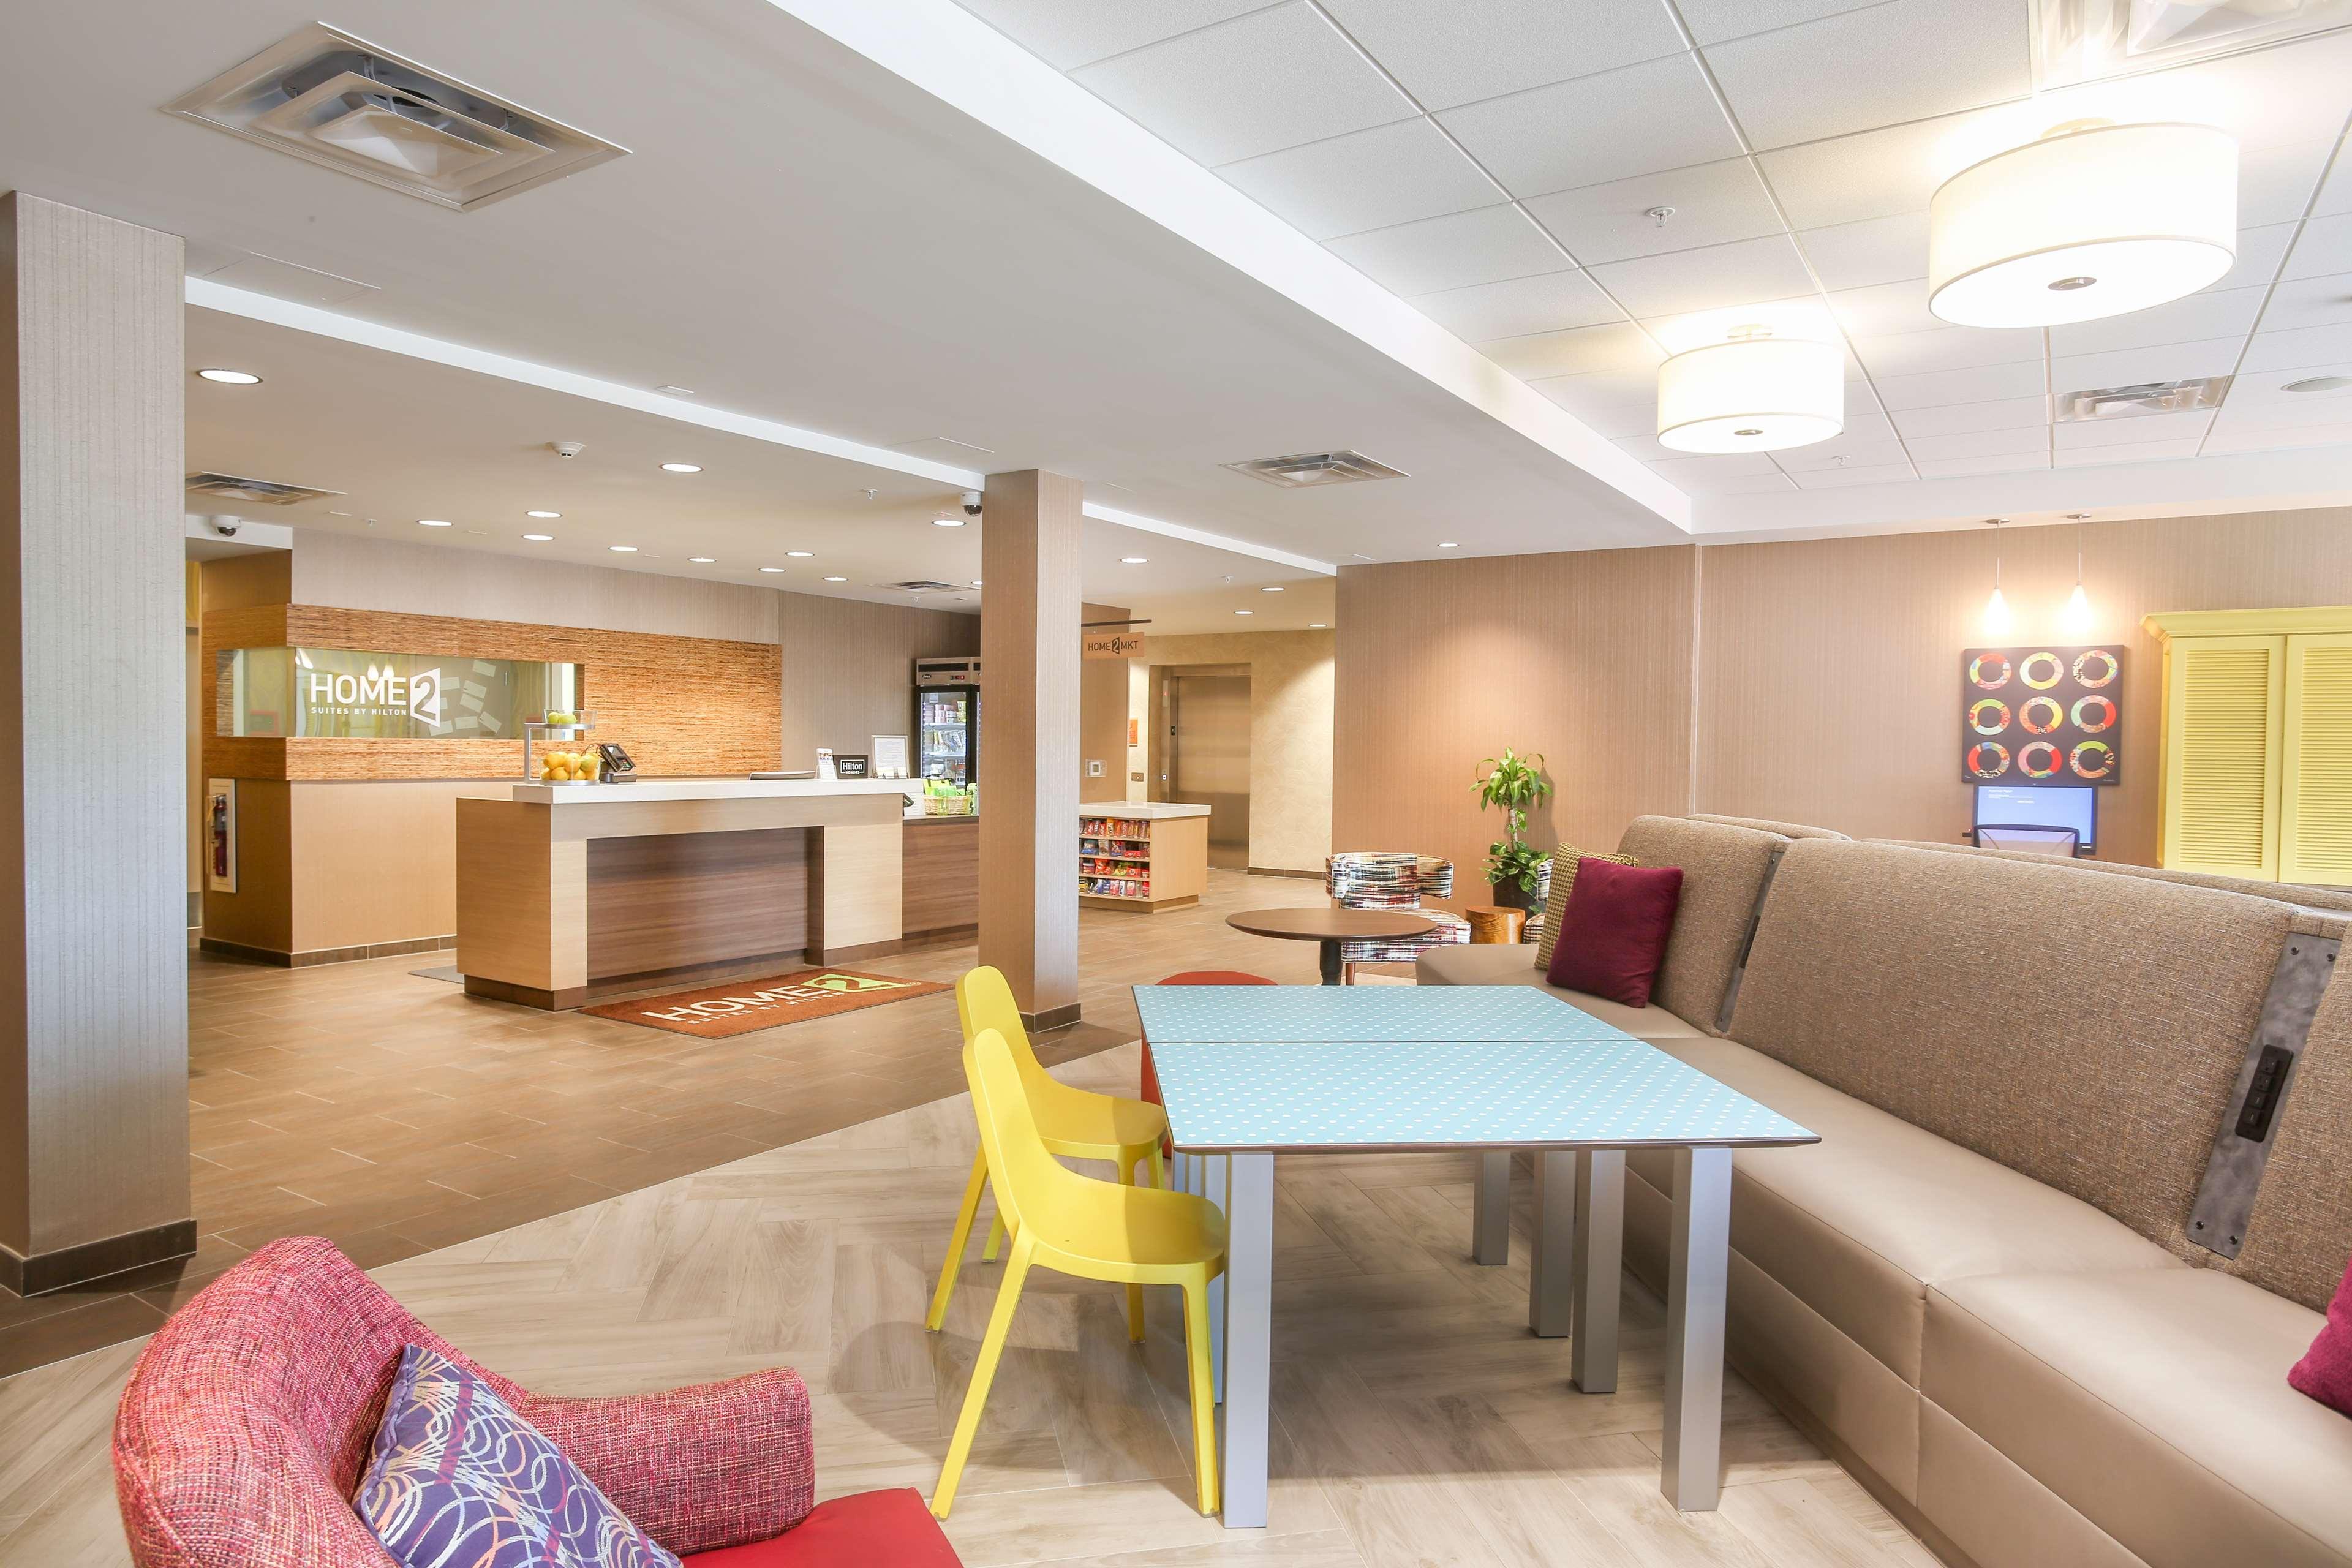 Home2 Suites by Hilton Bordentown image 10